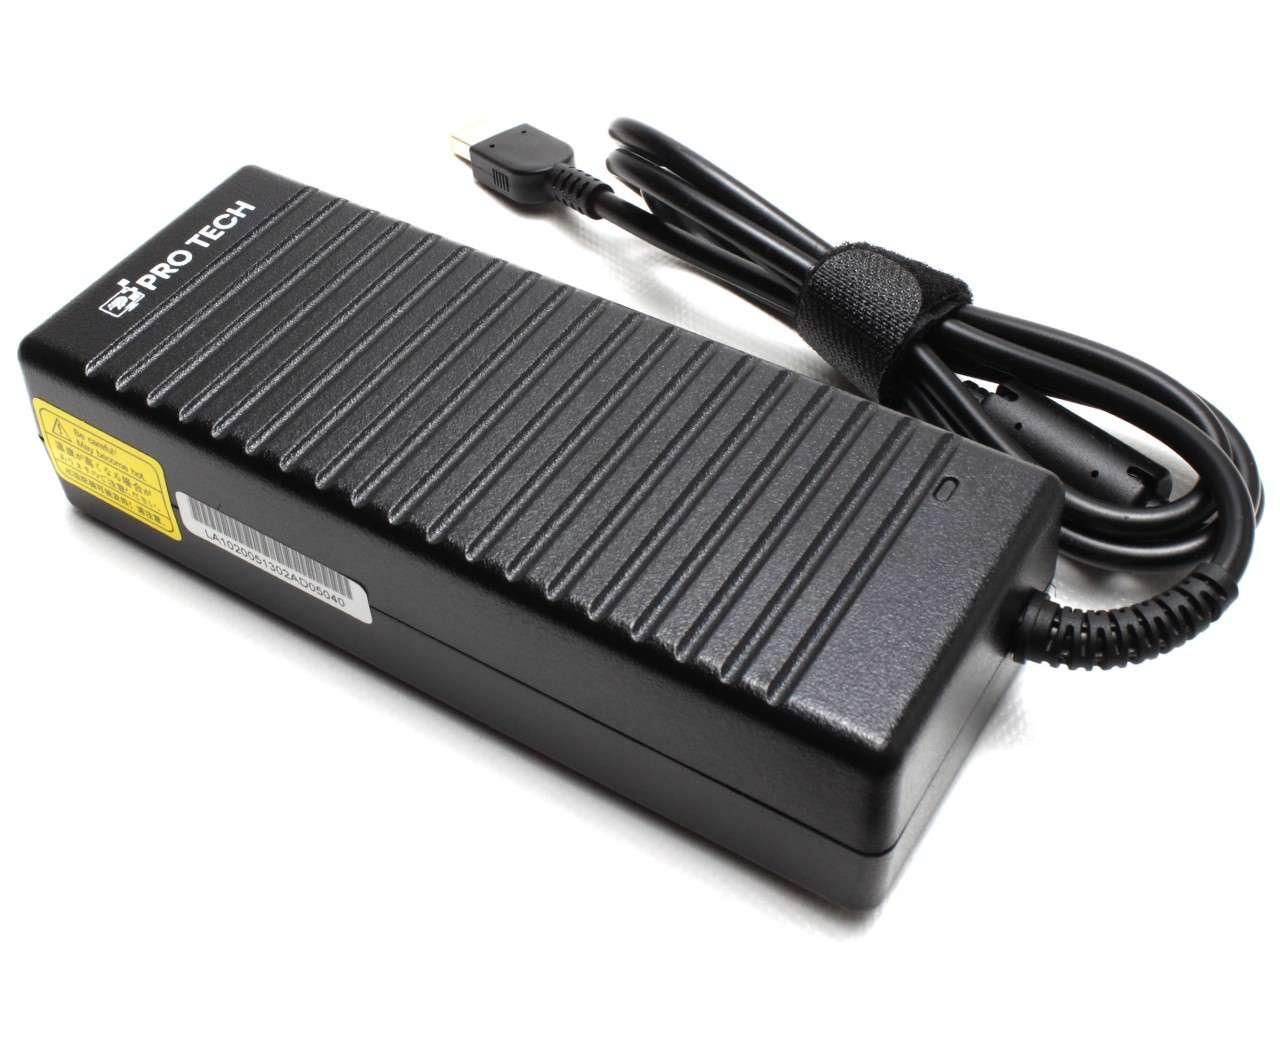 Incarcator Lenovo IdeaPad Y70 135W Replacement imagine